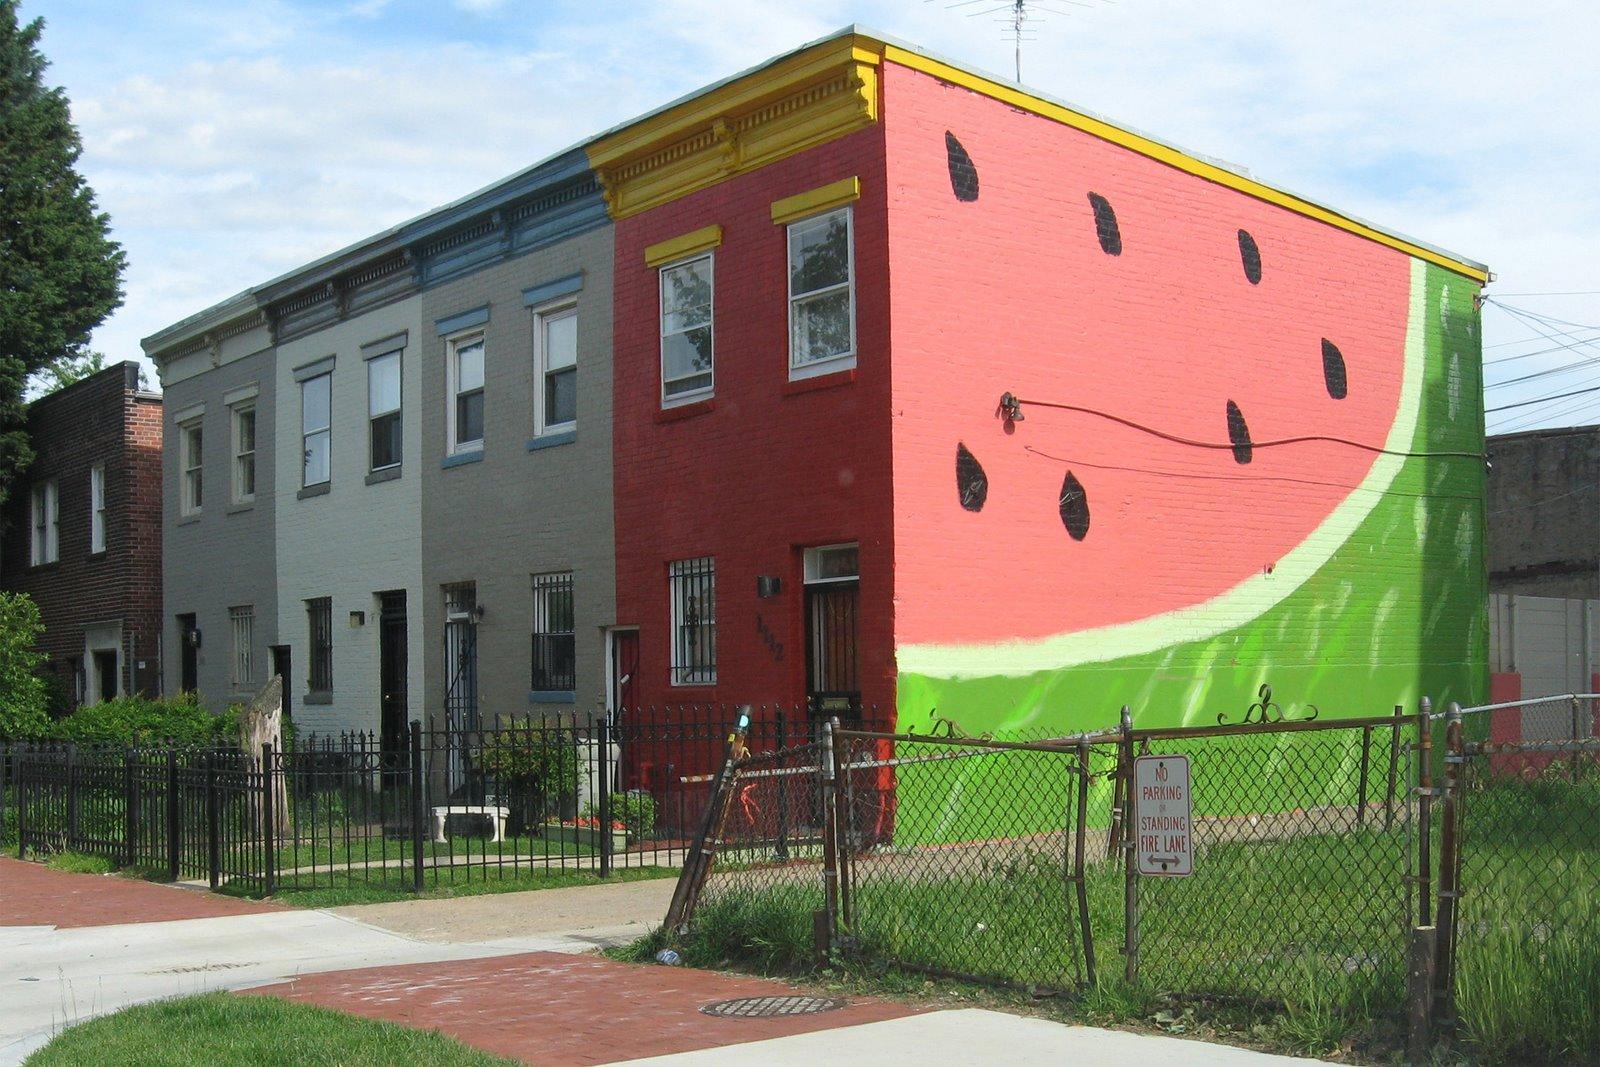 http://4.bp.blogspot.com/_pzKVH4KGXTc/SD3Nnk4mY6I/AAAAAAAAAPs/T40FKCUIv78/s1600/Watermelon+House,+DC,+IMG_0688.JPG